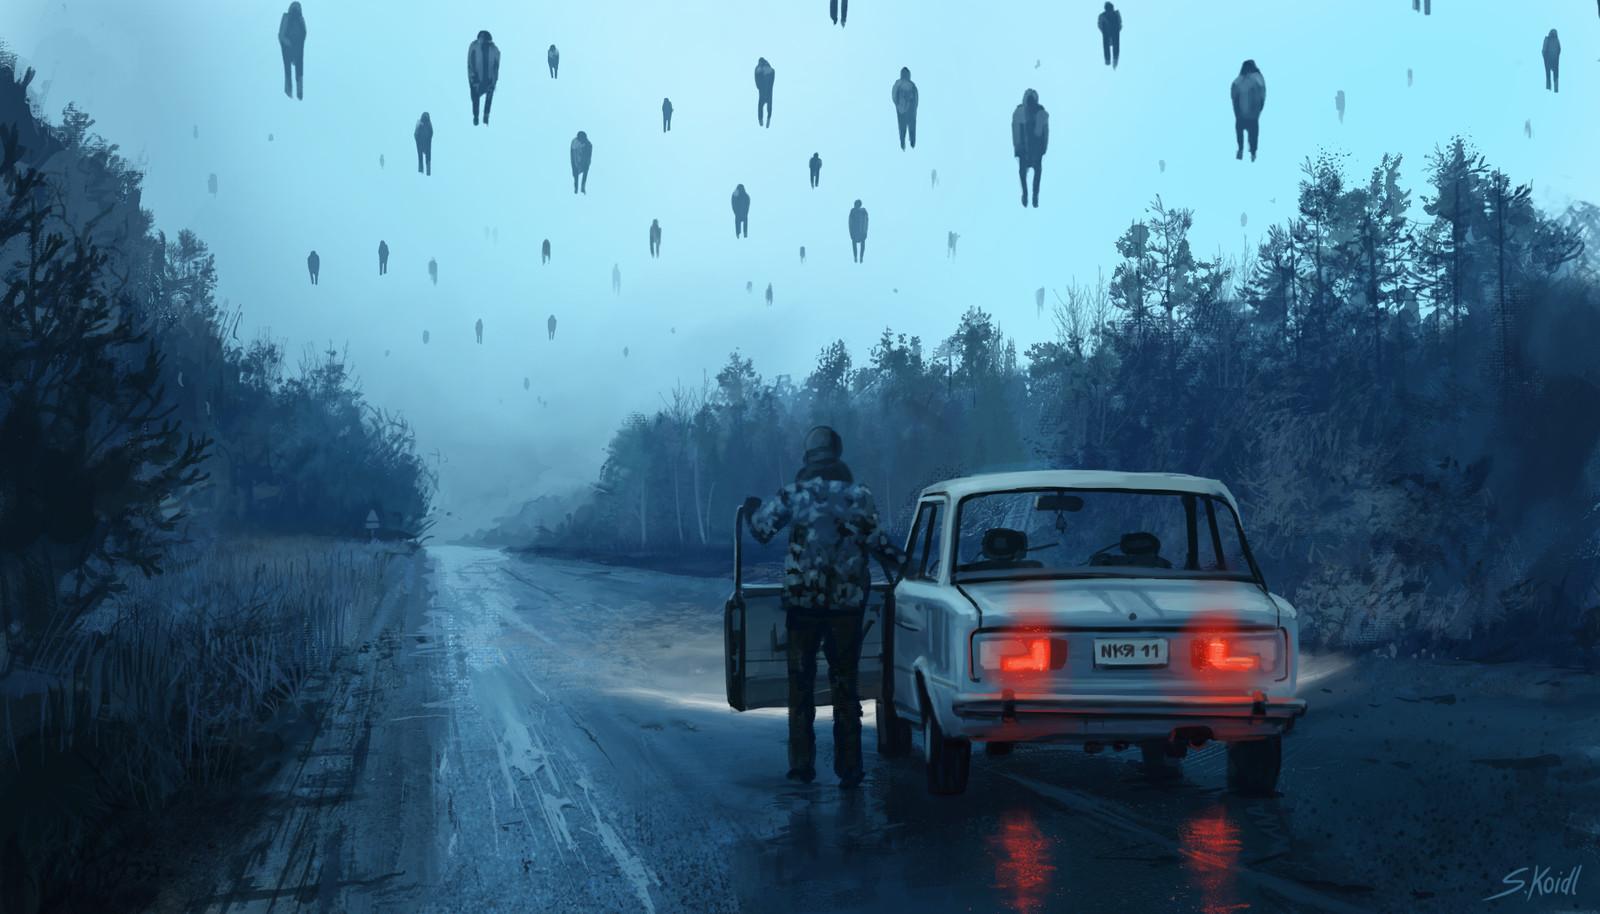 A Chernobyl Horror Story 6